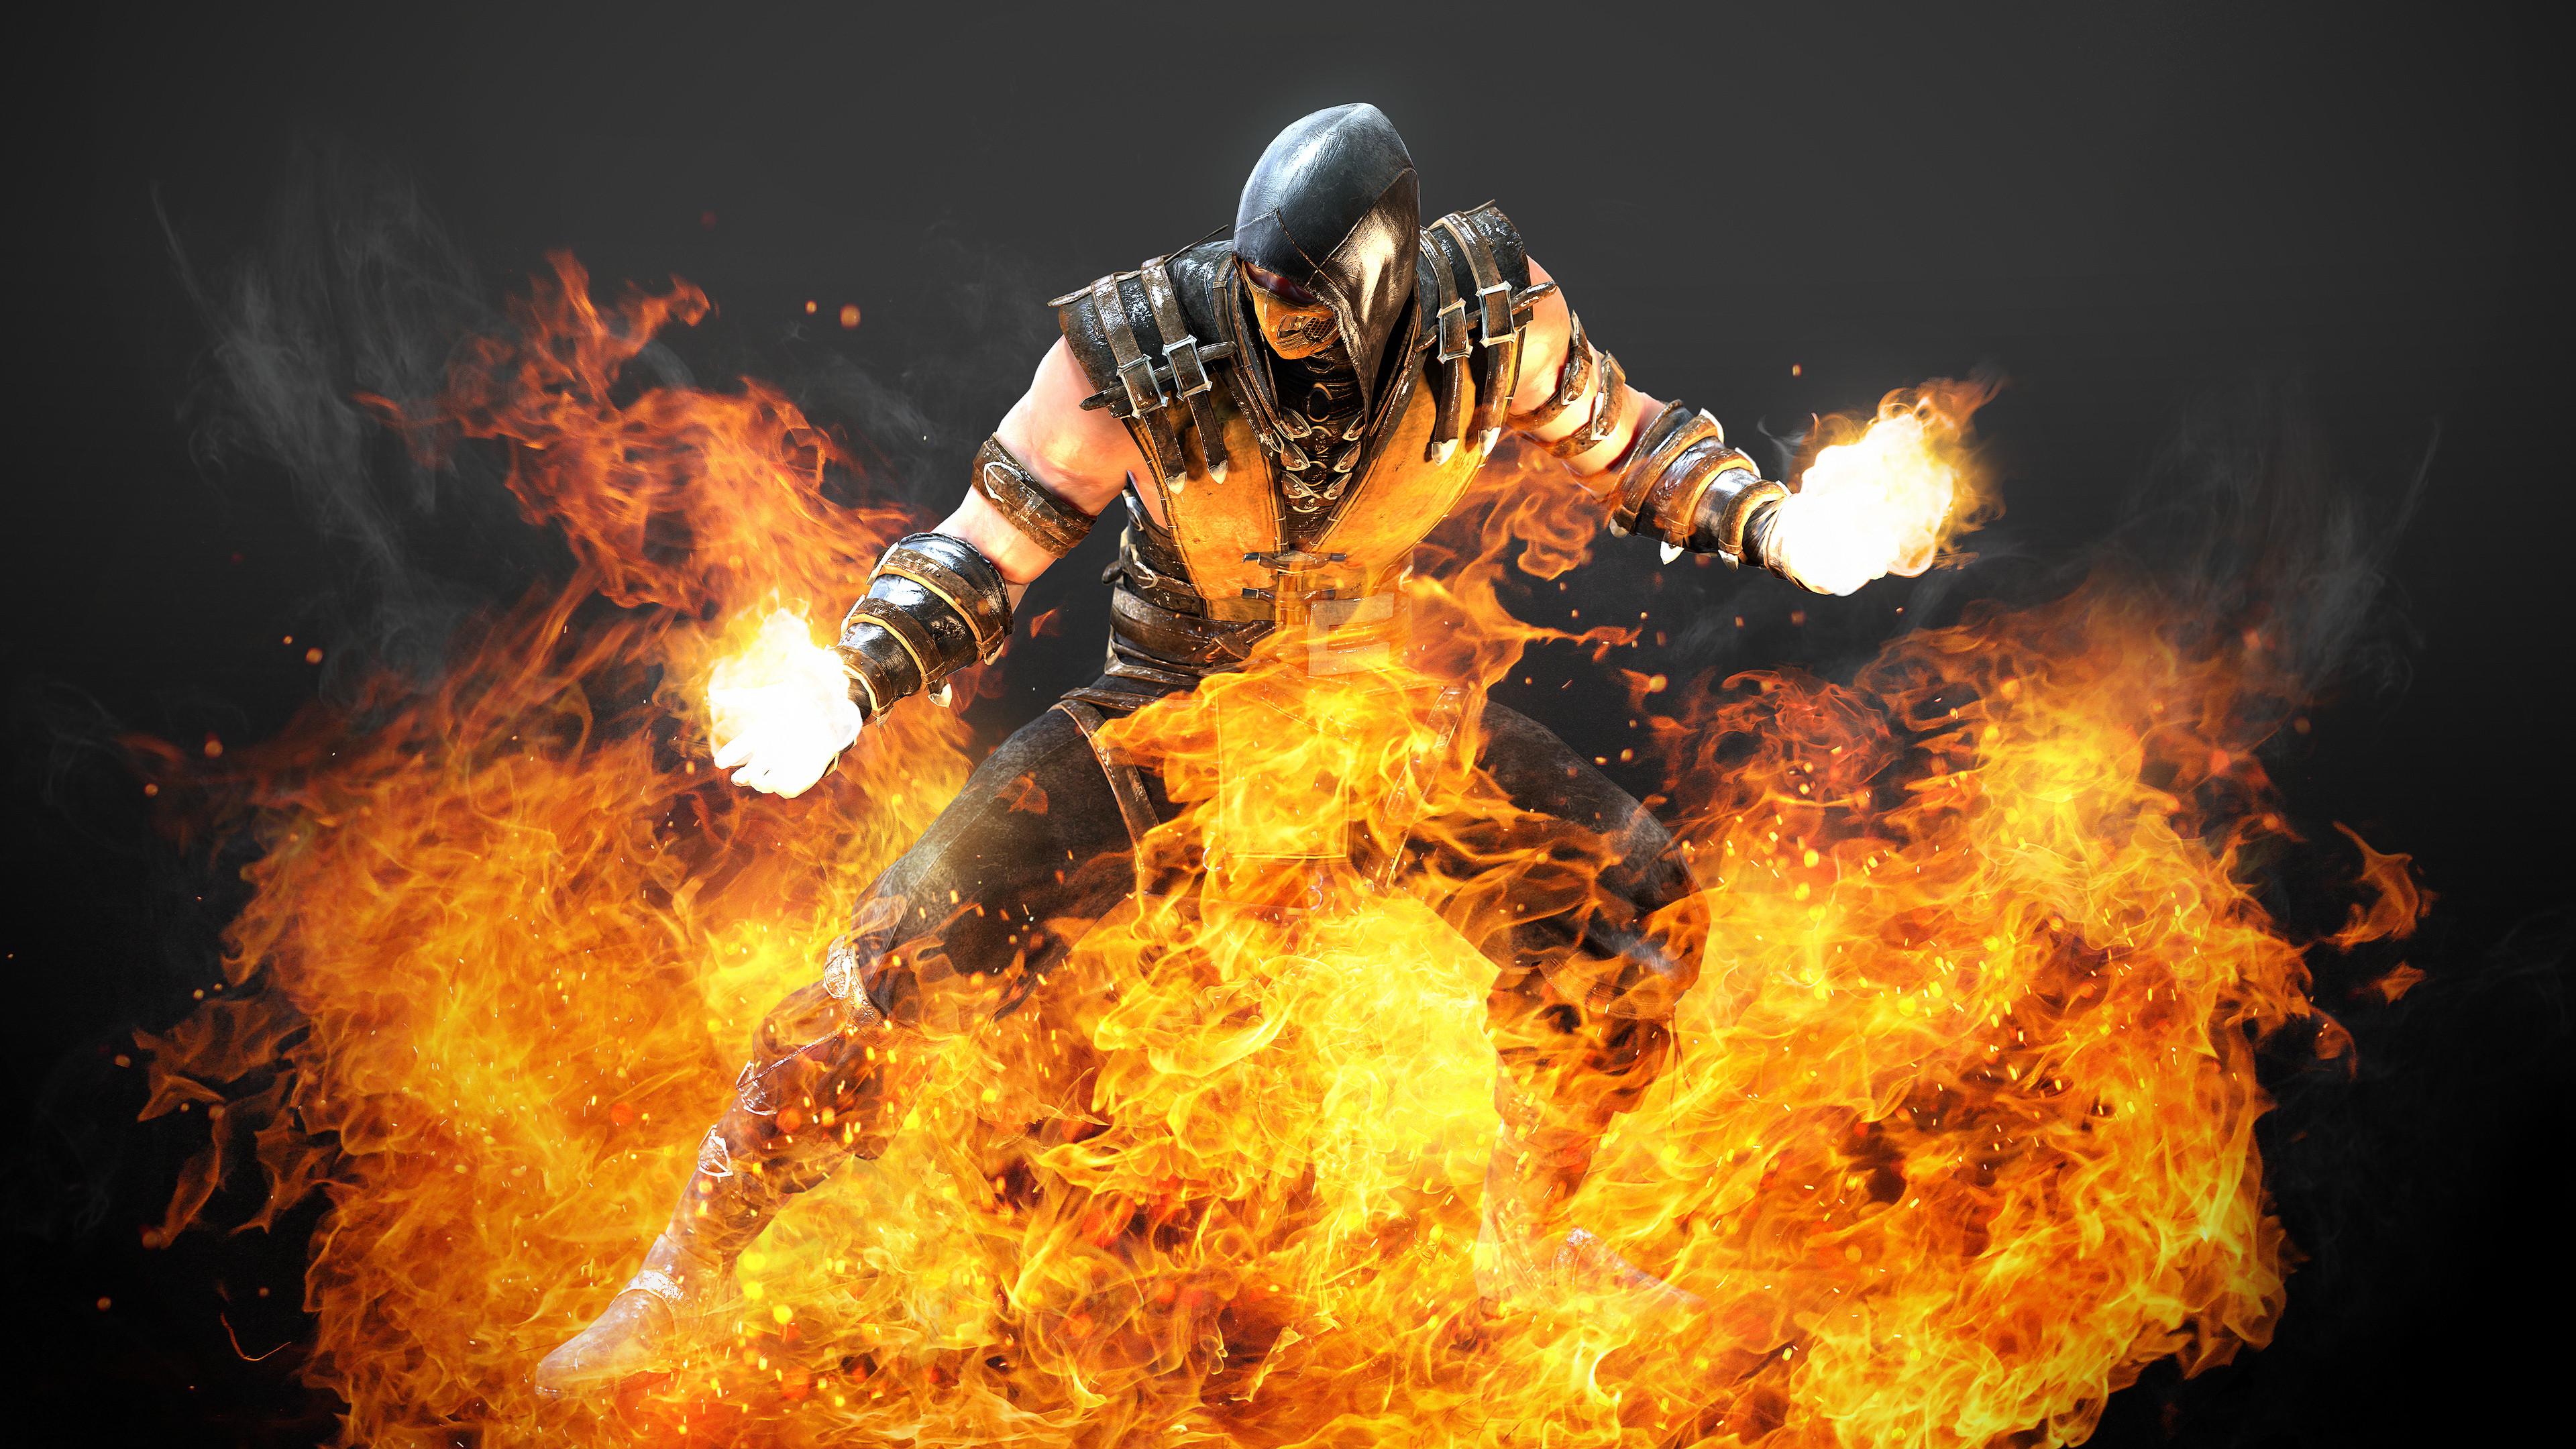 Res: 3840x2160, Hellfire Scorpion Mortal Kombat X 5k Artwork